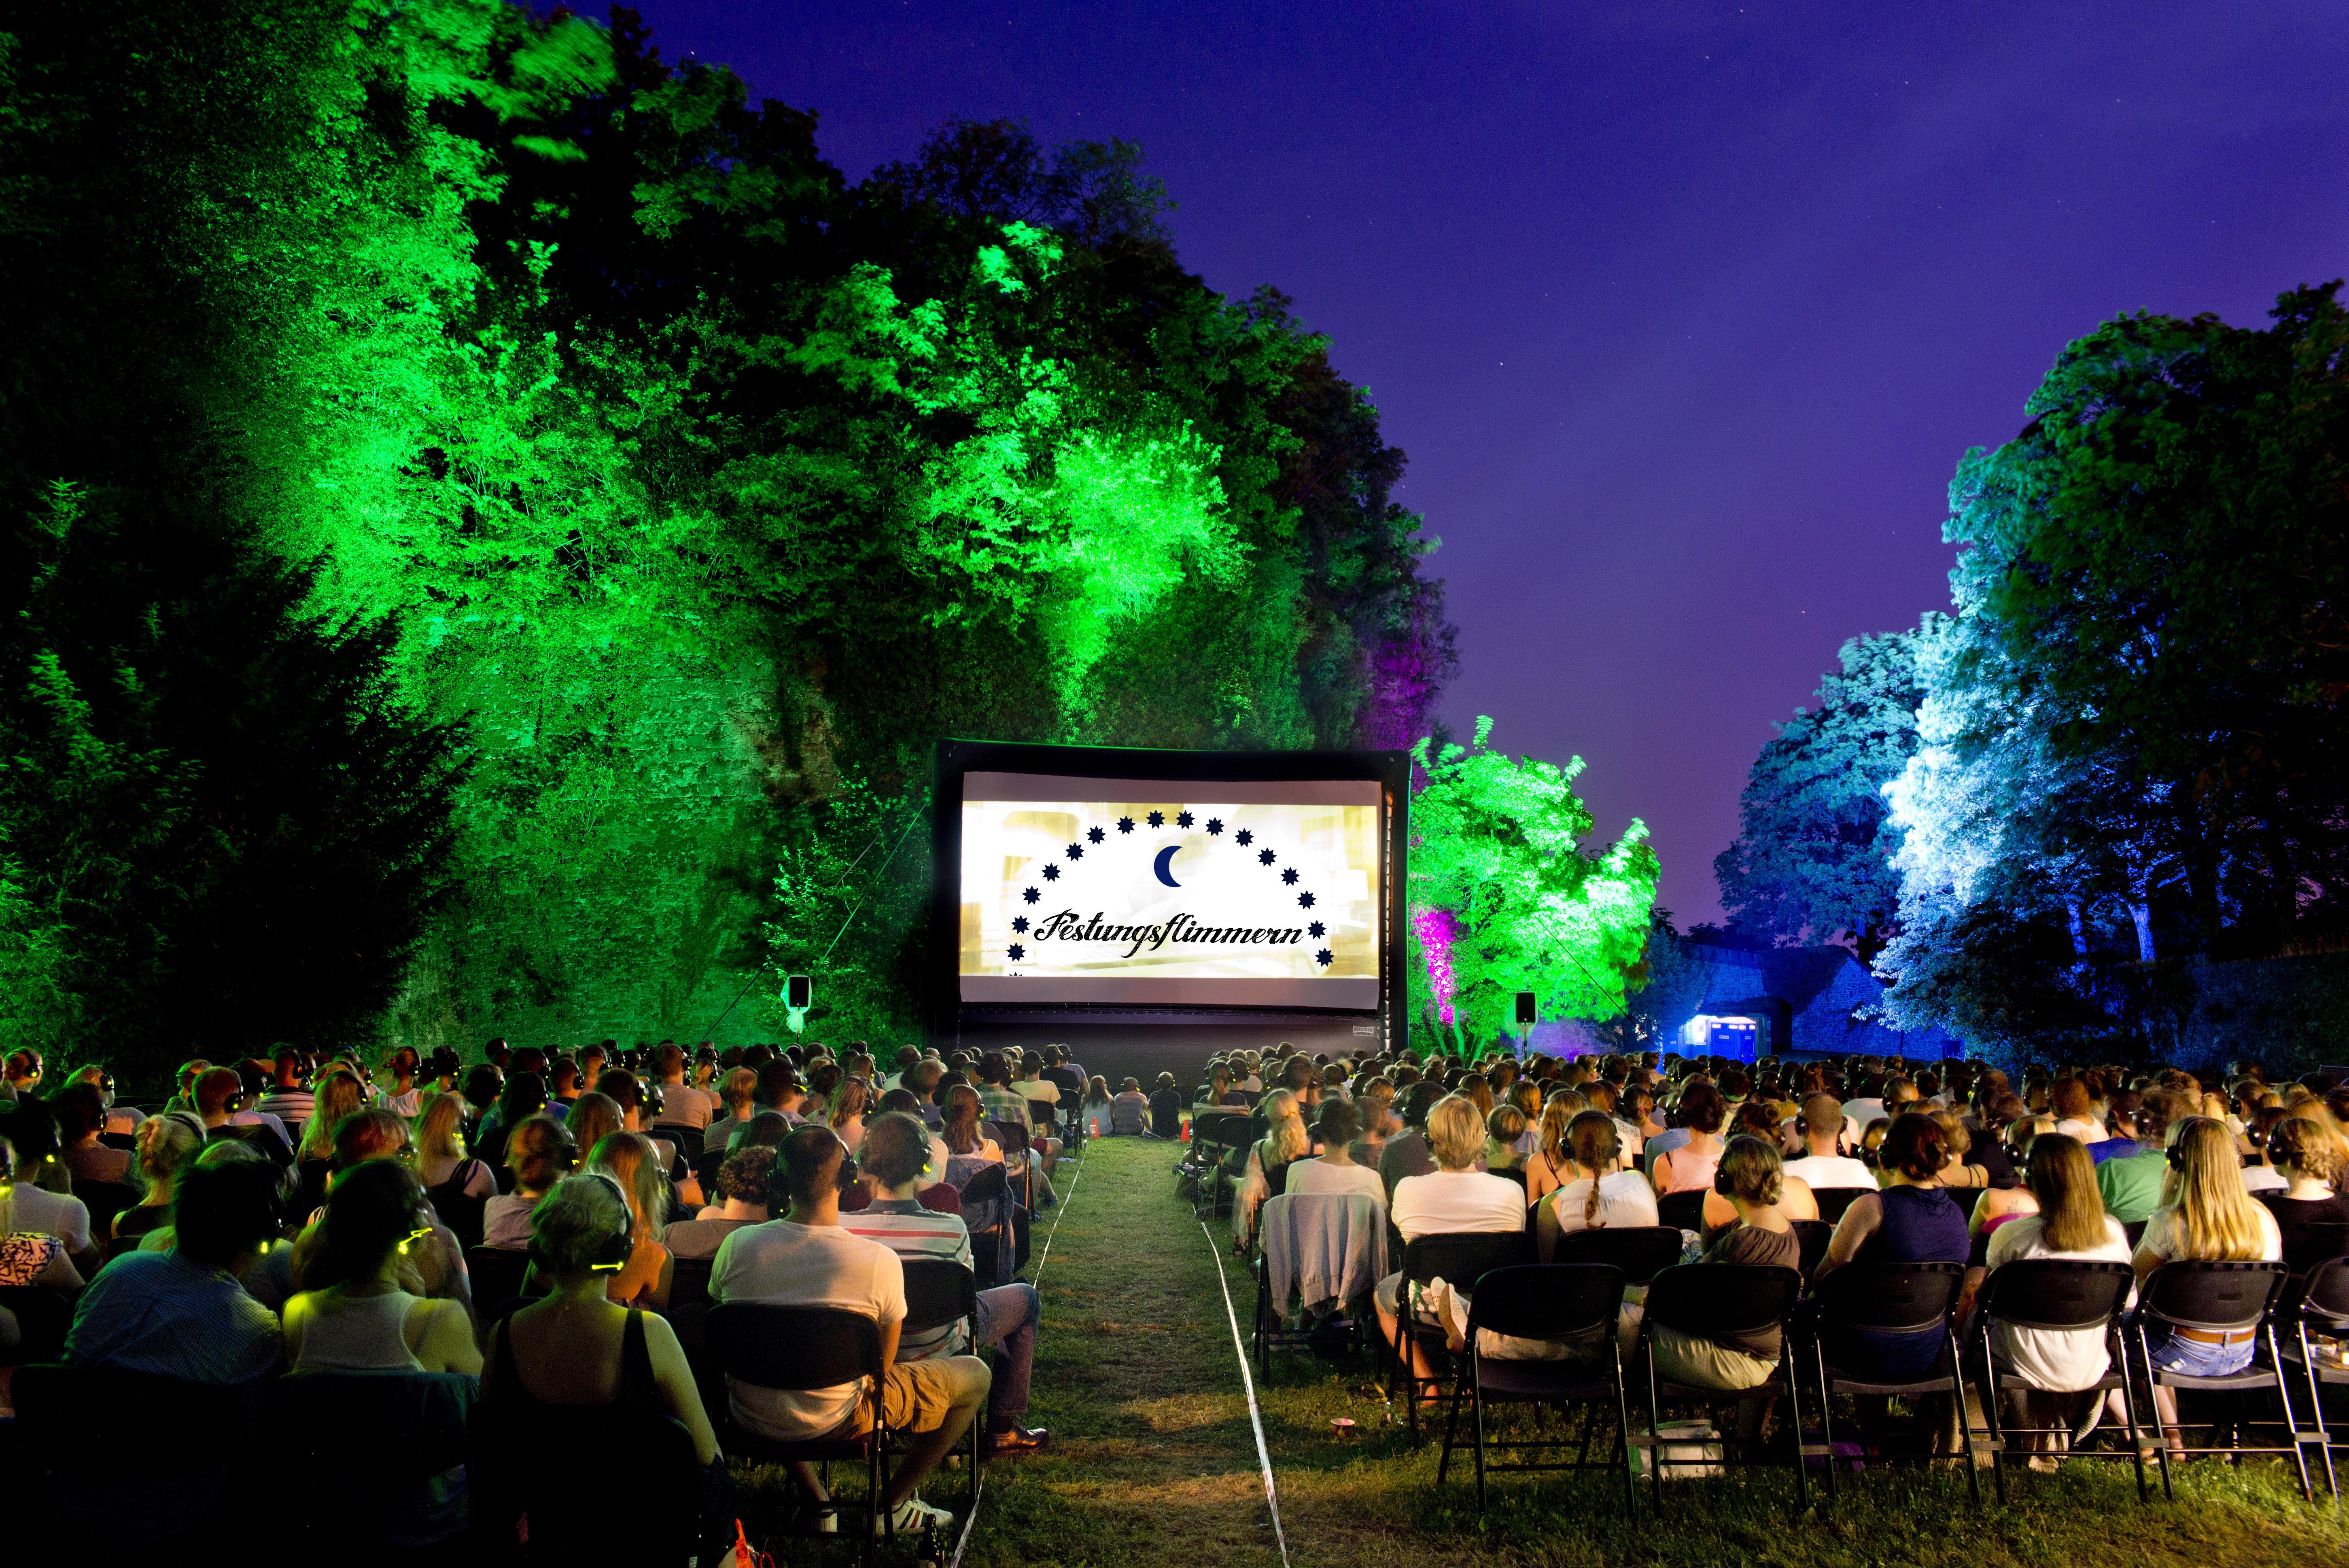 info festungsflimmern open air kino w rzburg. Black Bedroom Furniture Sets. Home Design Ideas